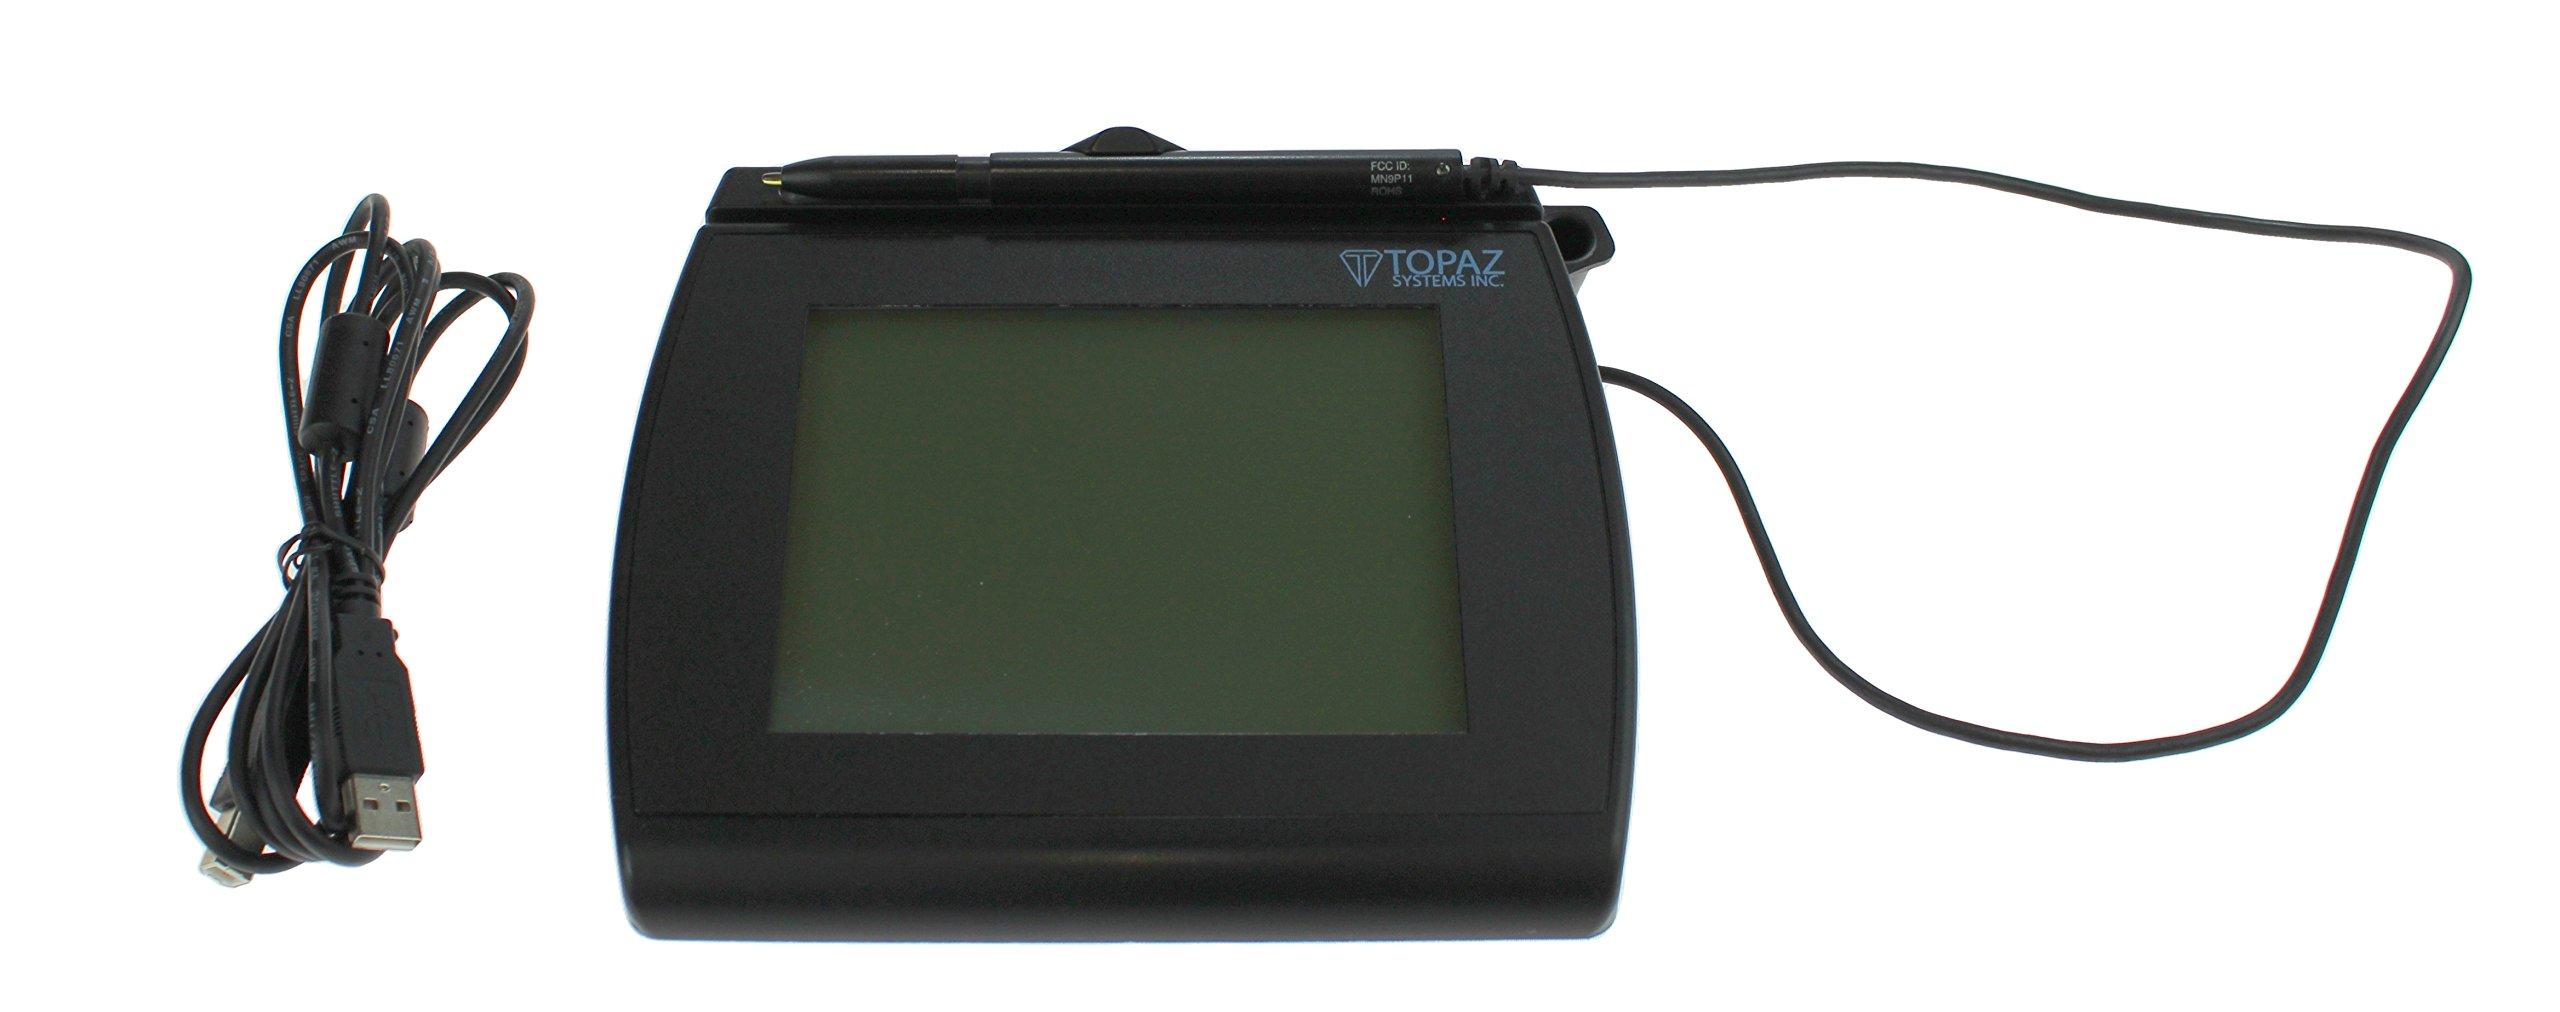 TOPAZ SYSTEMS T-LBK766SE-BHSB-R TOPAZ SIGNATUREGEM LCD 4X5 SE INCL SIGPLUS SW by Topaz